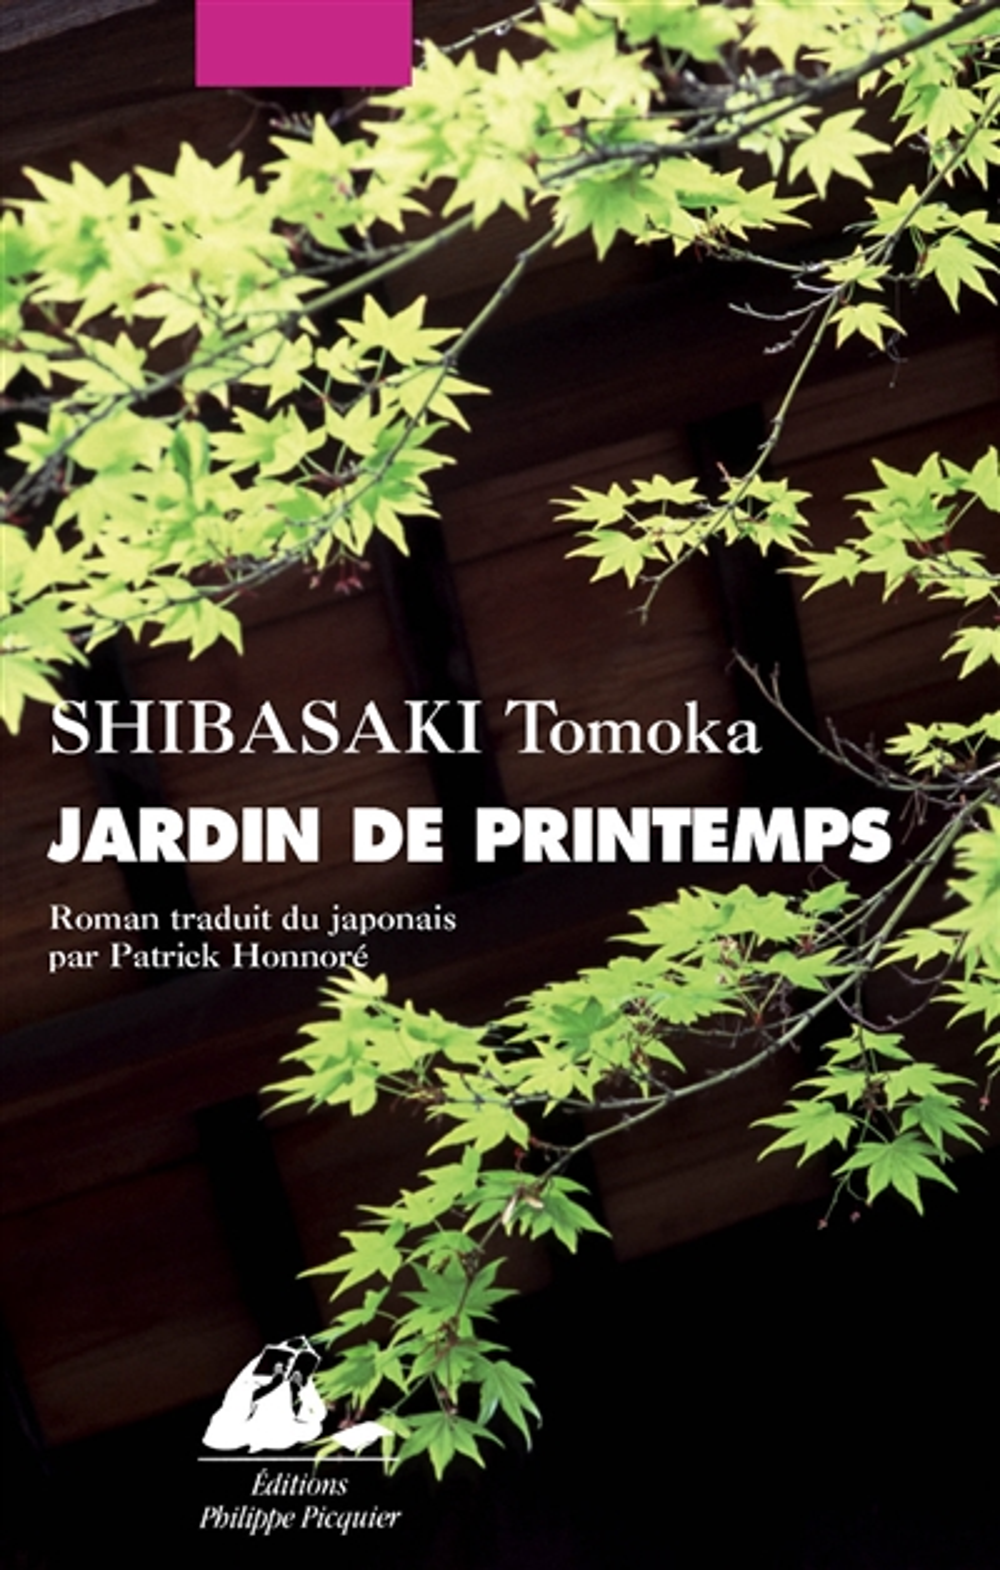 Shibasaki Tomoka - JARDIN DE PRINTEMPS